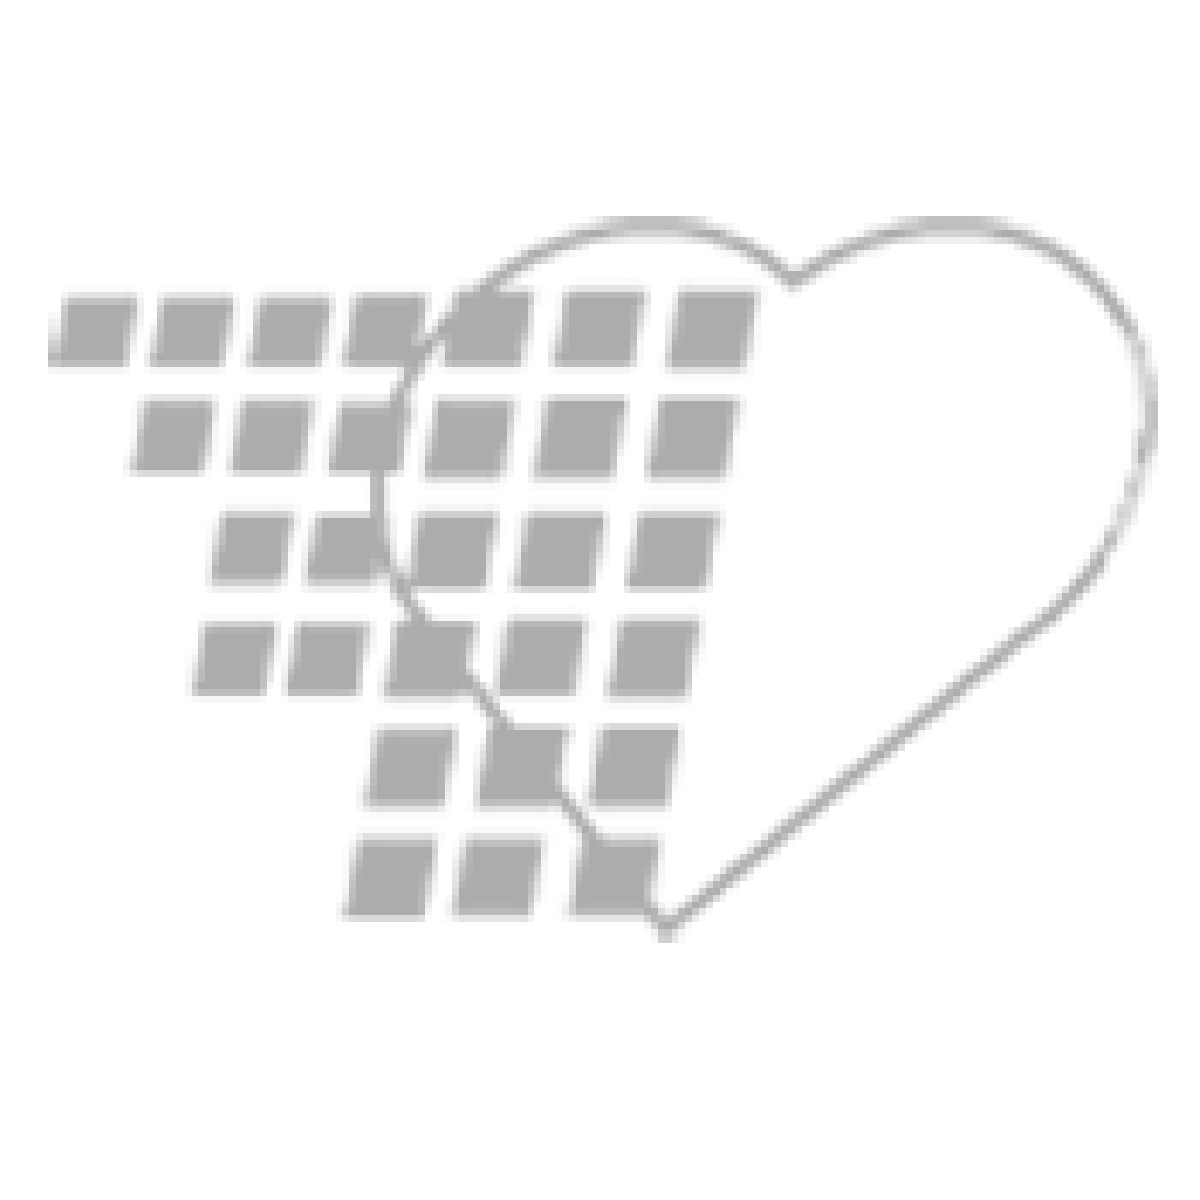 "06-26-1423 - Autoguard IV Cath 22G x 1"" Wingless"